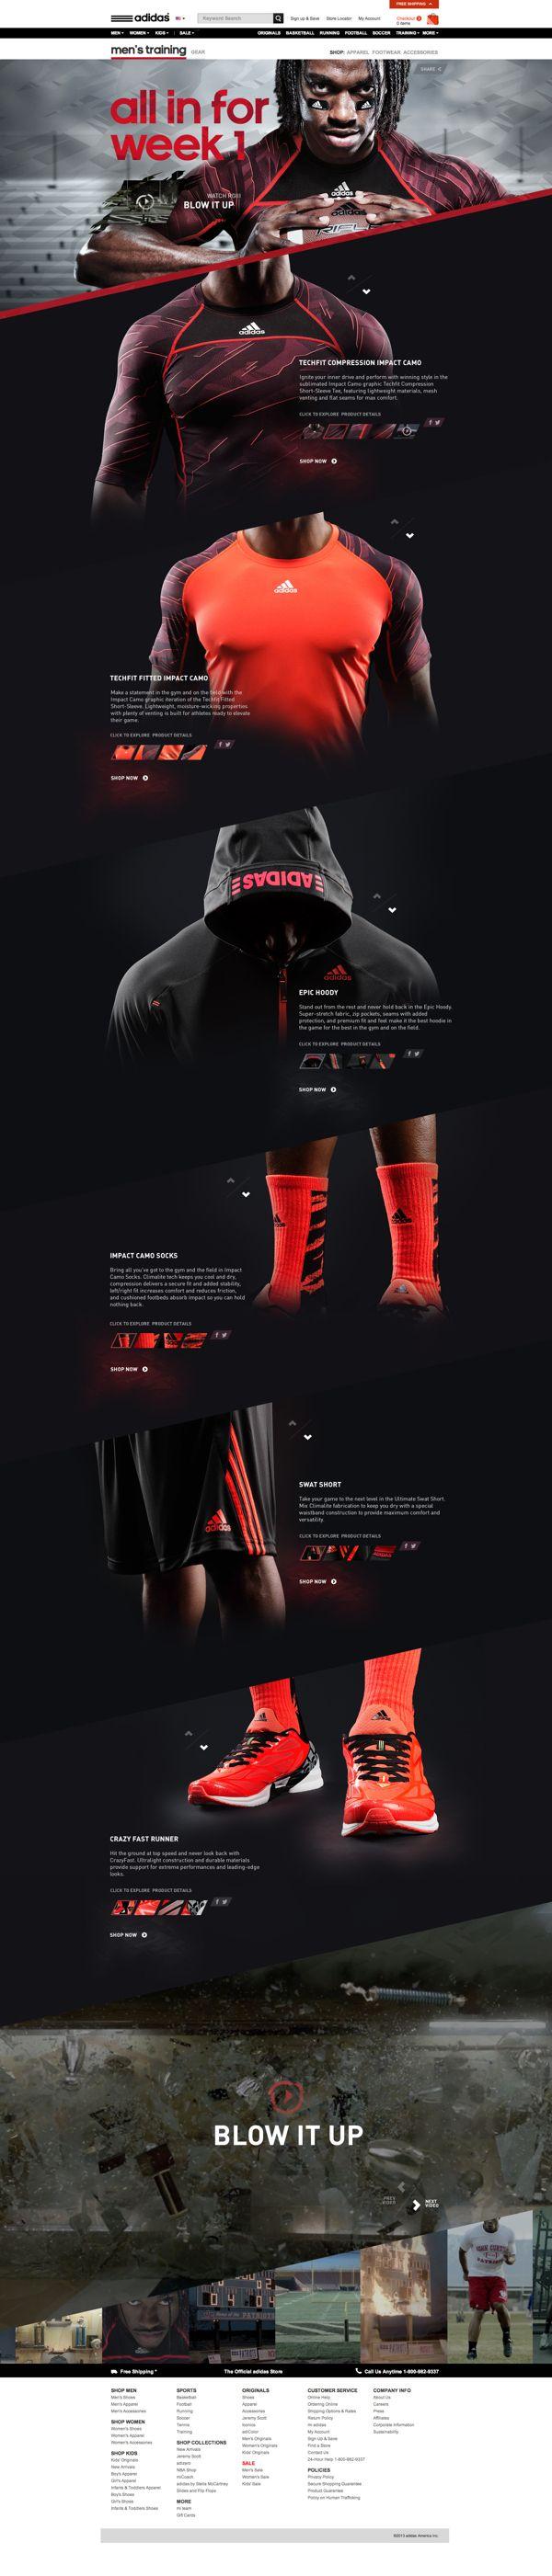 5 talentueux Webdesigners et Designers d'interface #3 | Design Spartan : Art digital, digital painting, webdesign, illustration et inspiration…